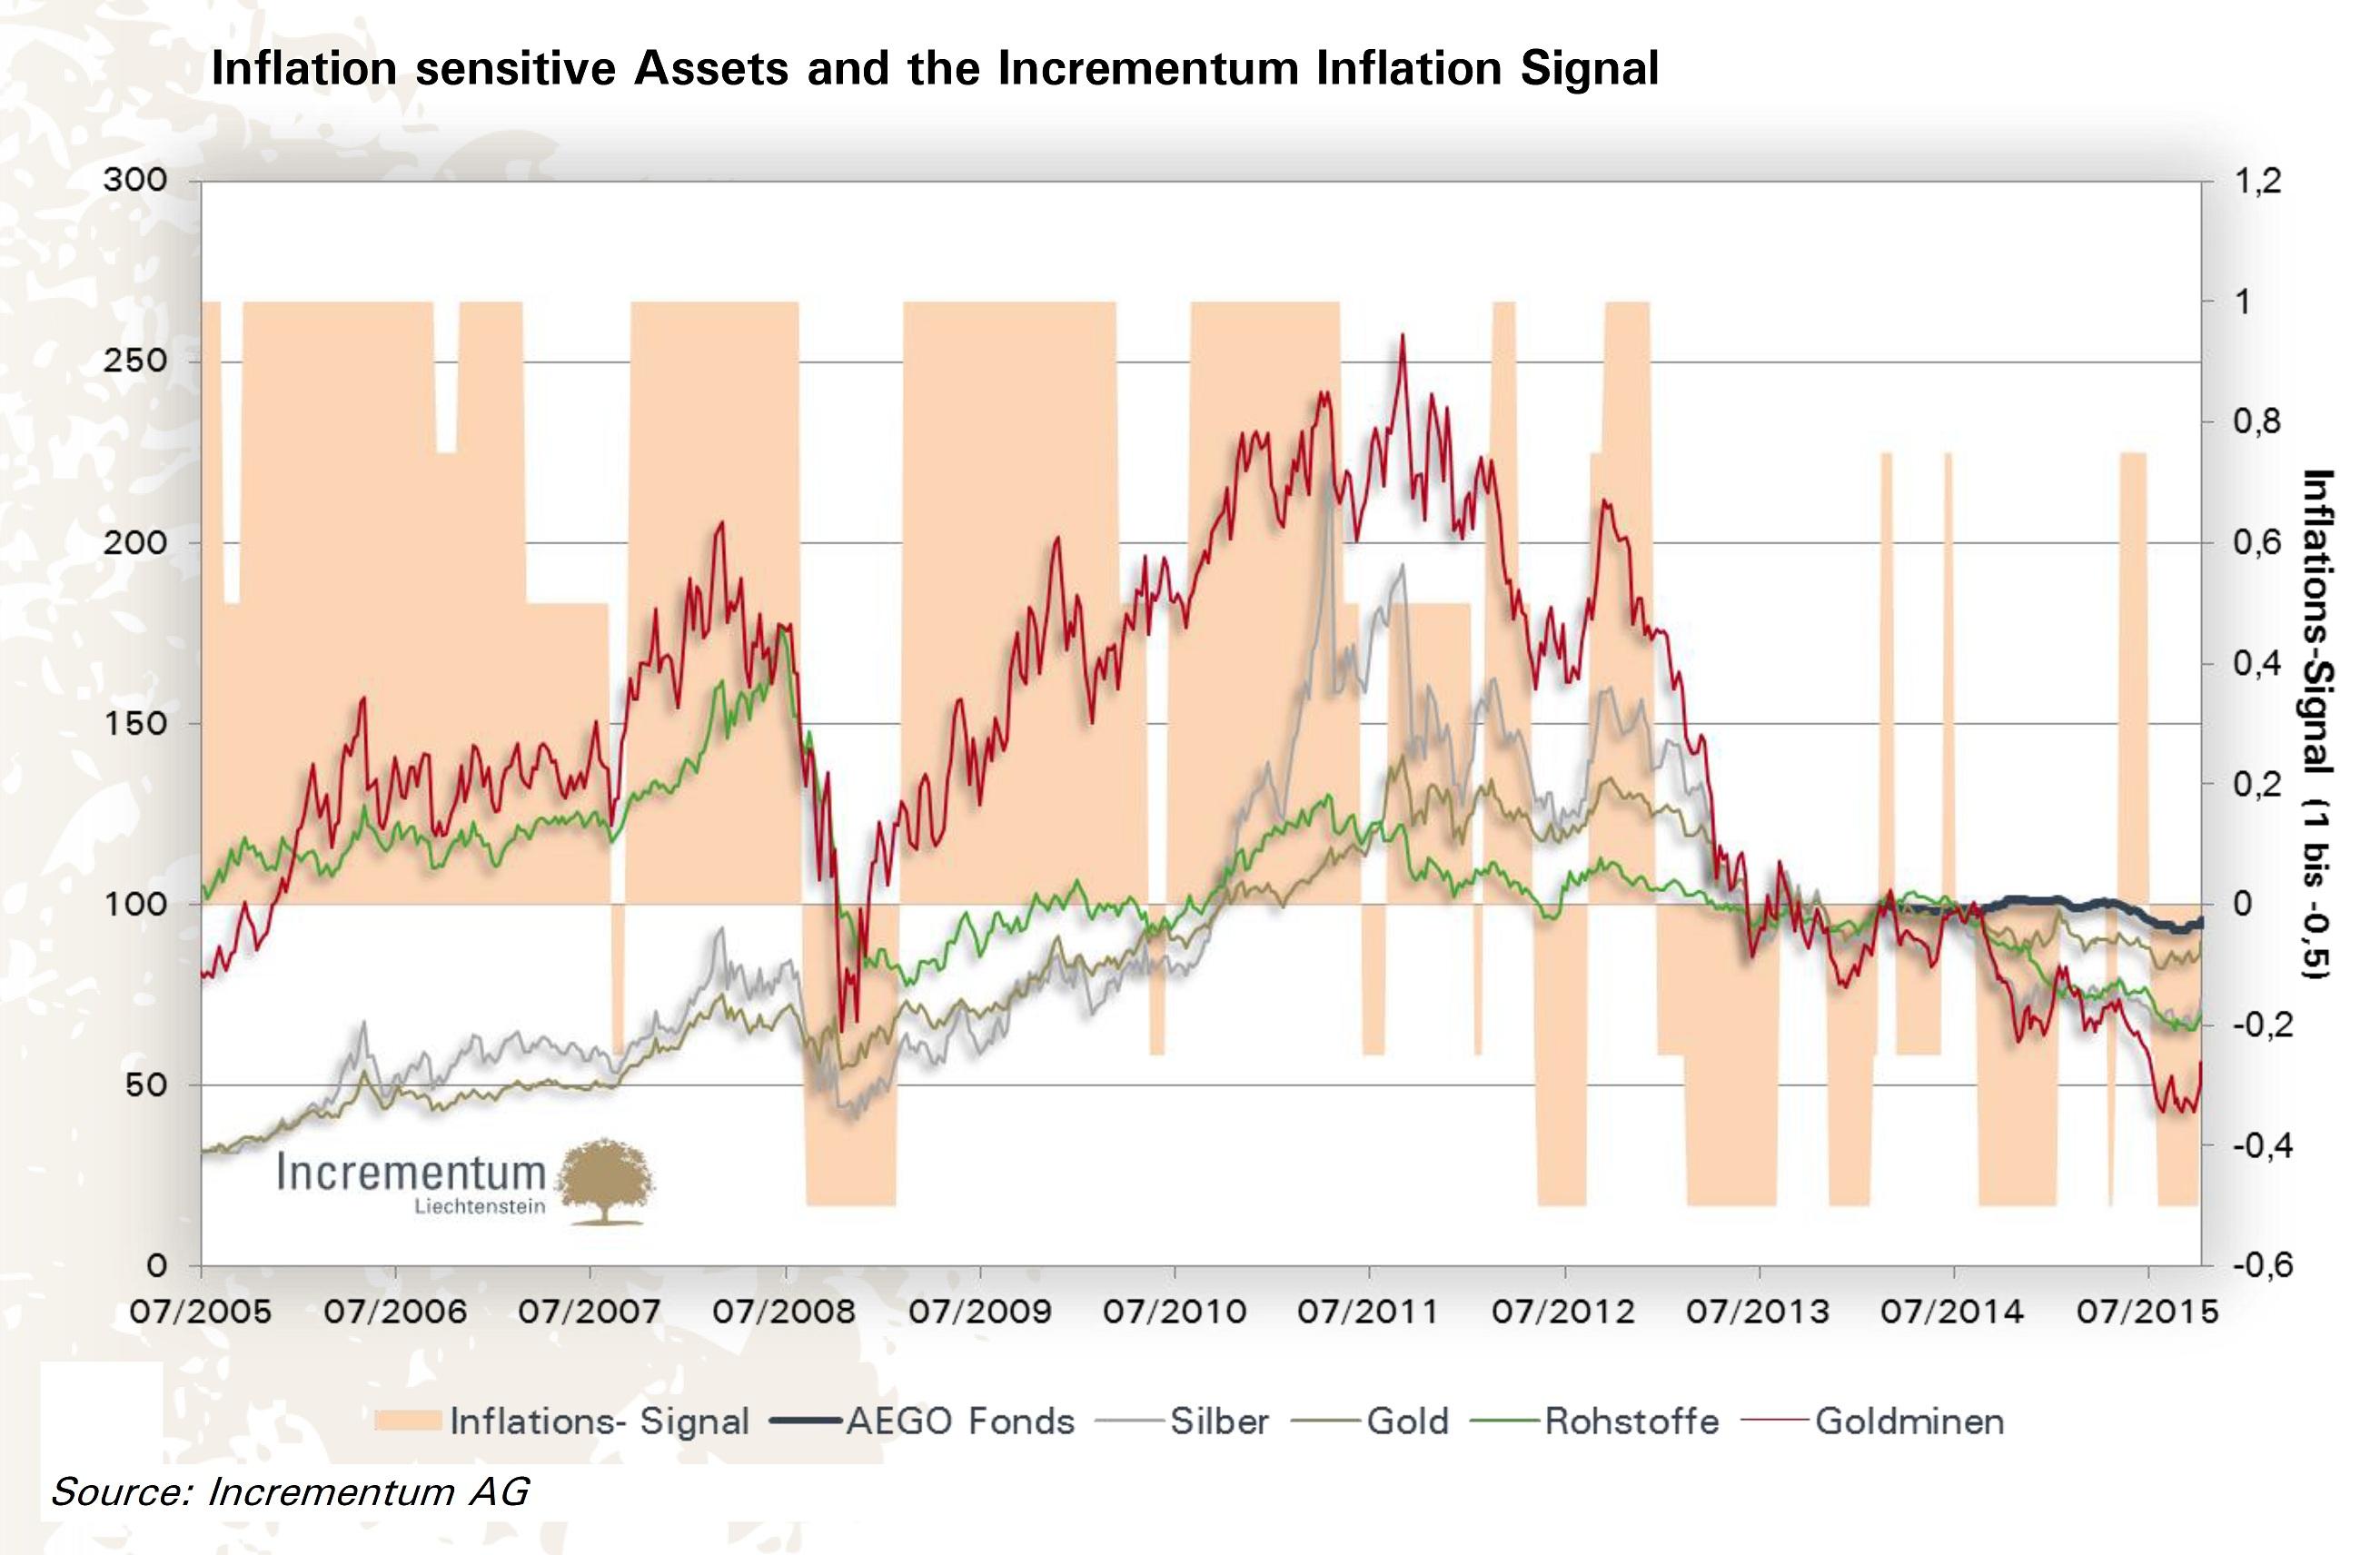 1-Incrementum-Inflation-Signal